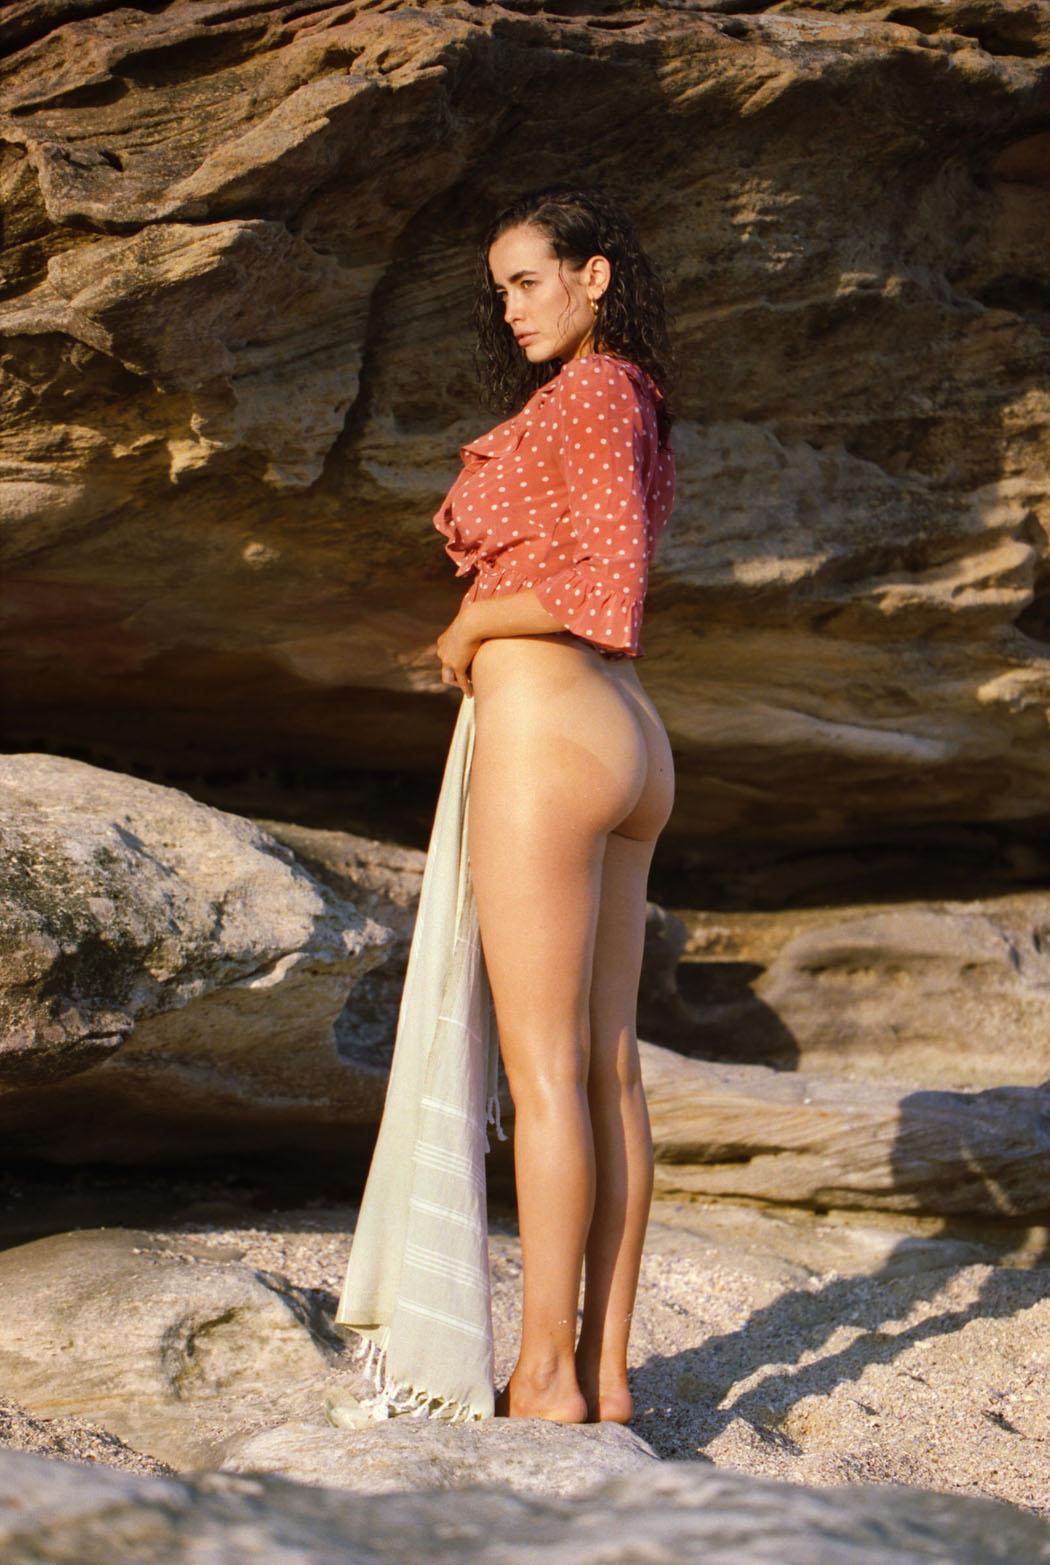 sarah-stephens-seaside-erotic-photo-by-cameron-mackie-04